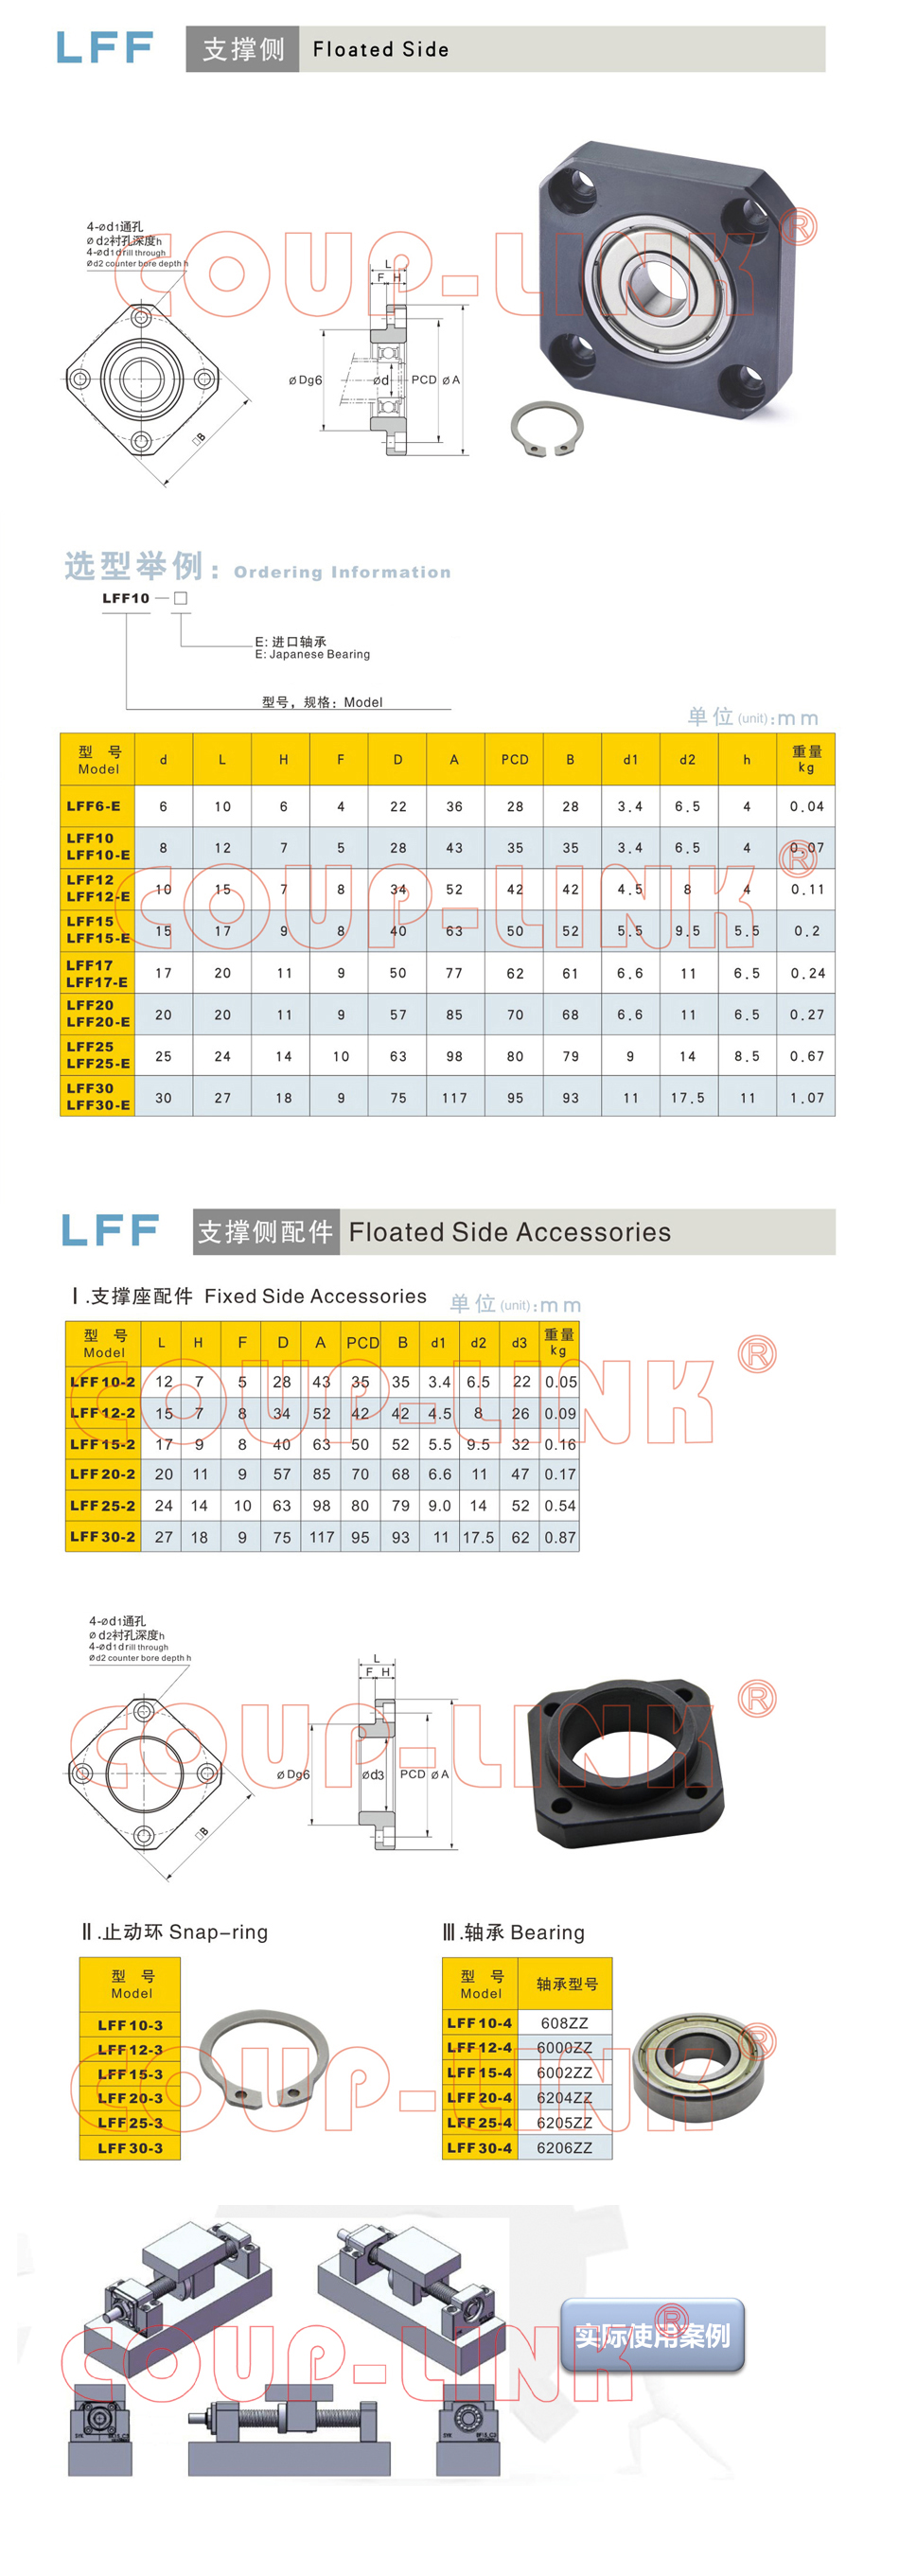 LFF 支撐側_老子有钱app種類-廣州老子有钱自動化設備有限公司